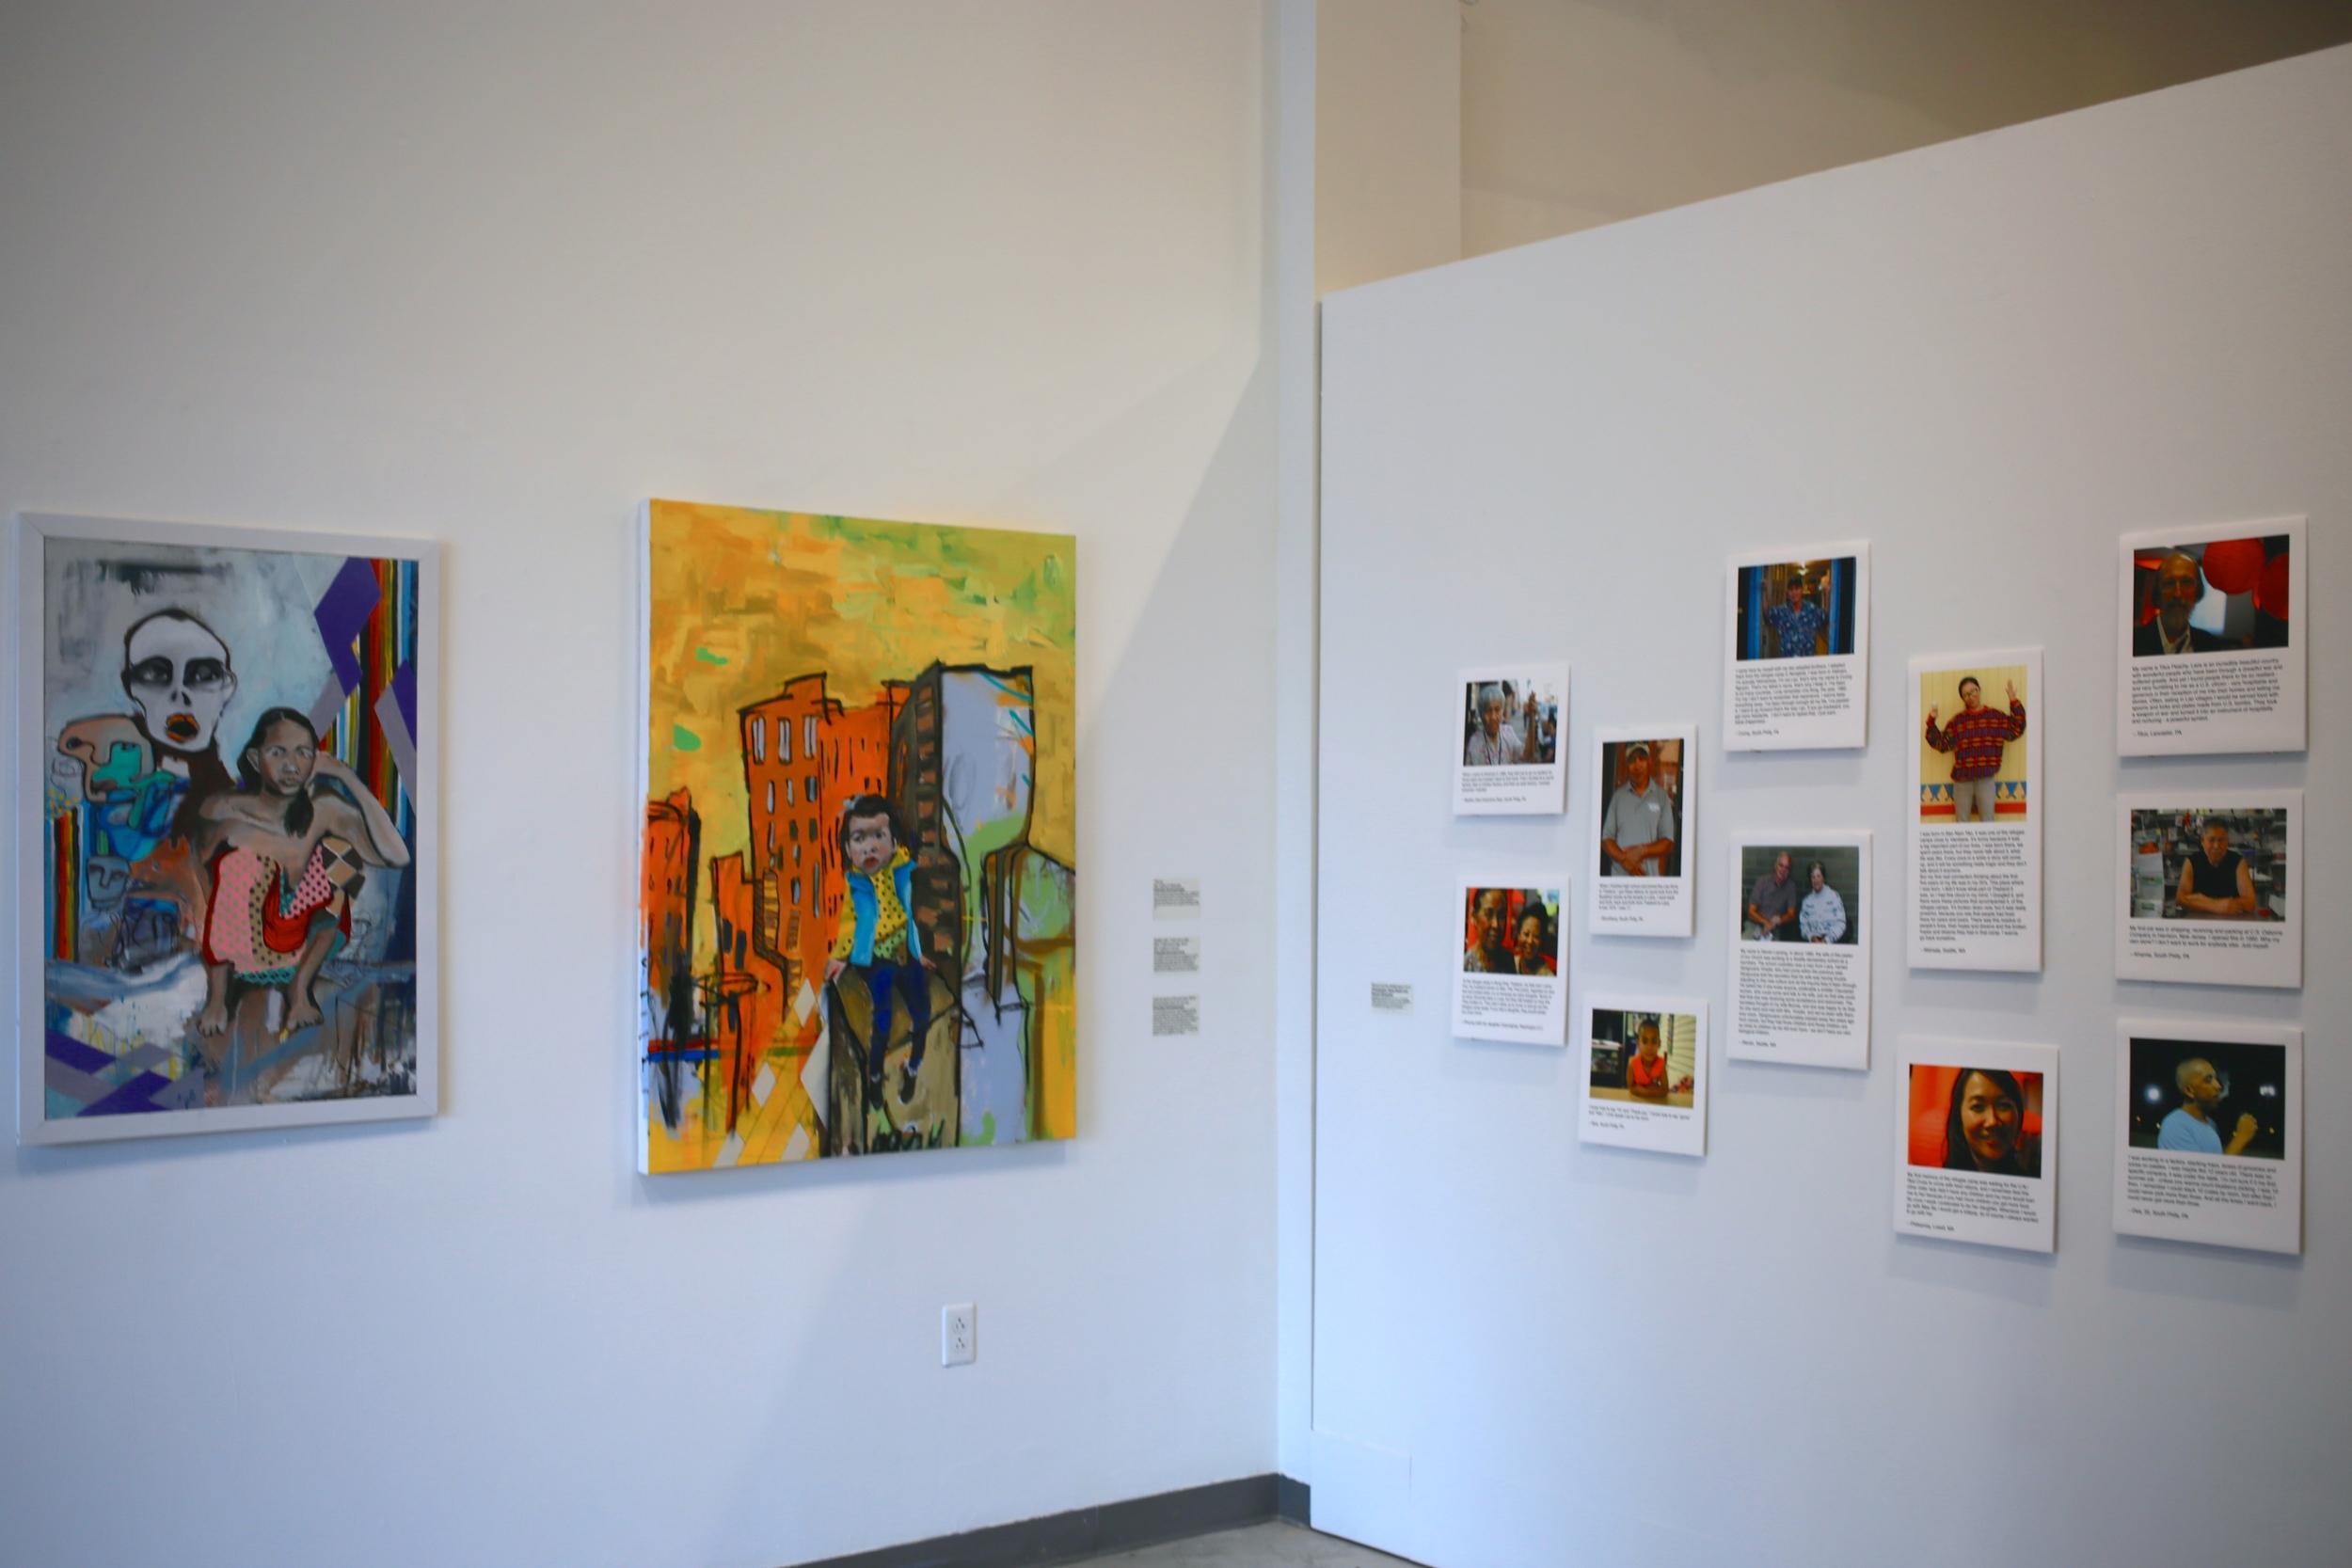 LaosInTheHouse_gallery_chantala_storiesboard_corner.JPG